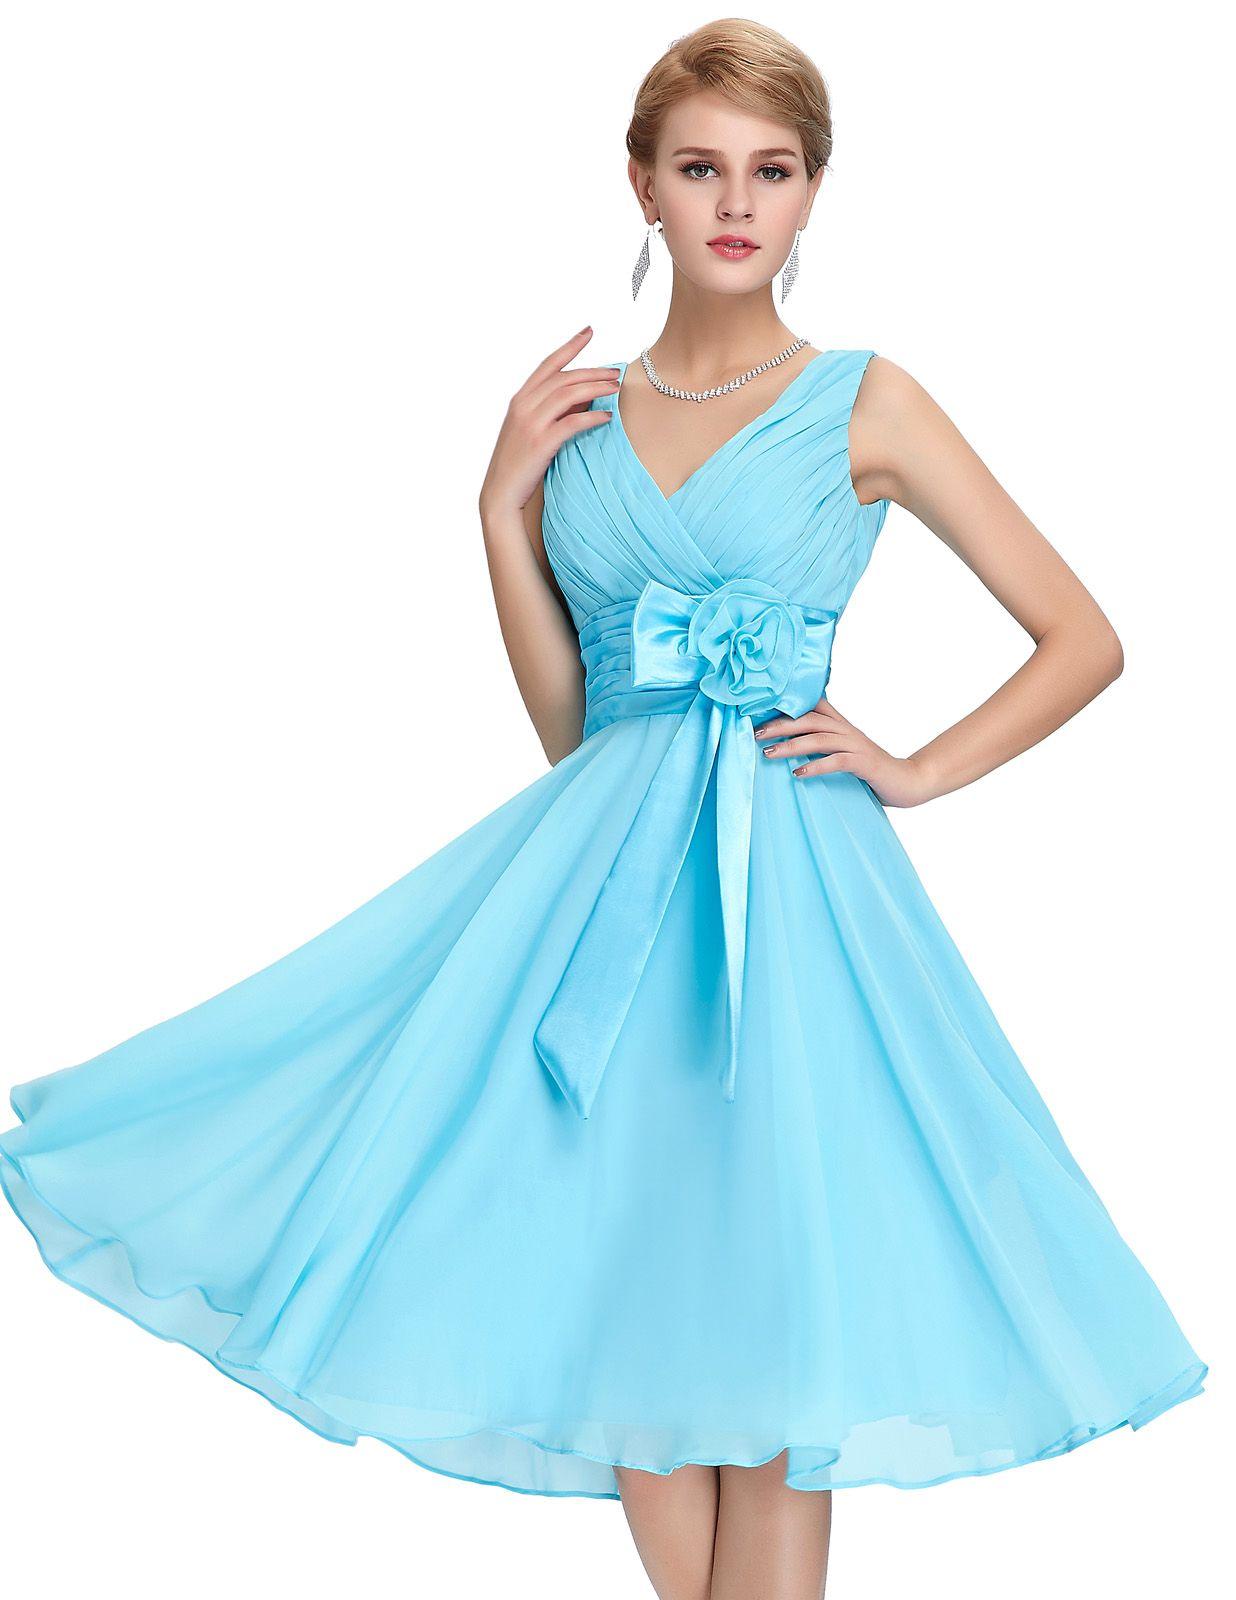 6bcc79e4715 Sky Blue V-Neck Chiffon Simple Short Homecoming Dress A Line Knee-Length  Prom Dress Mini